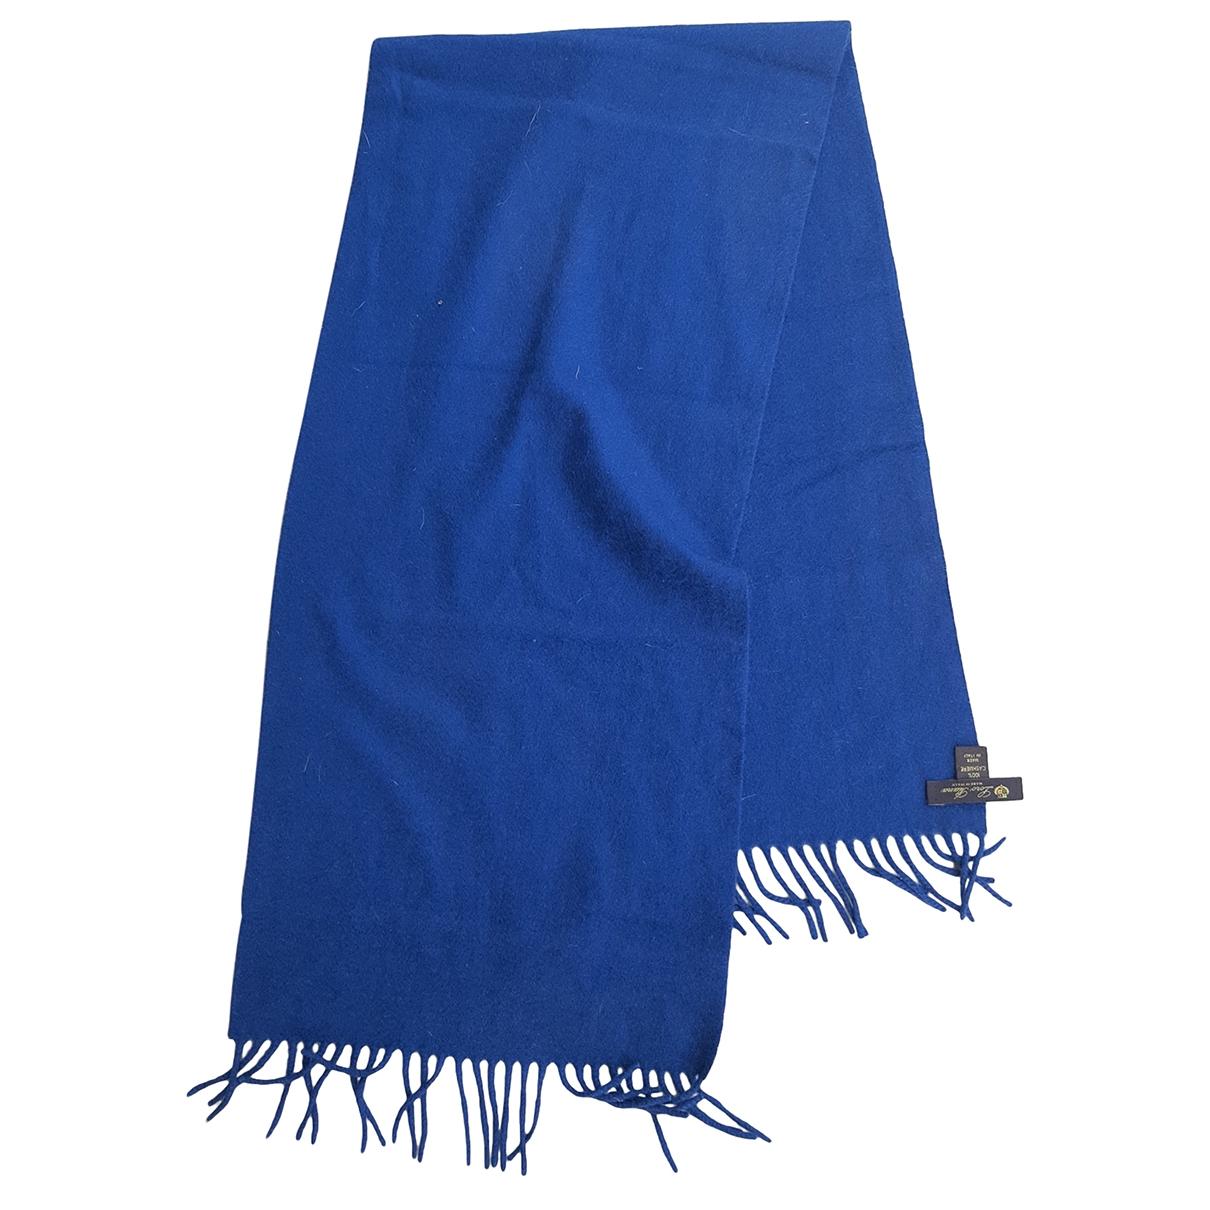 Loro Piana \N Blue Cashmere scarf & pocket squares for Men \N